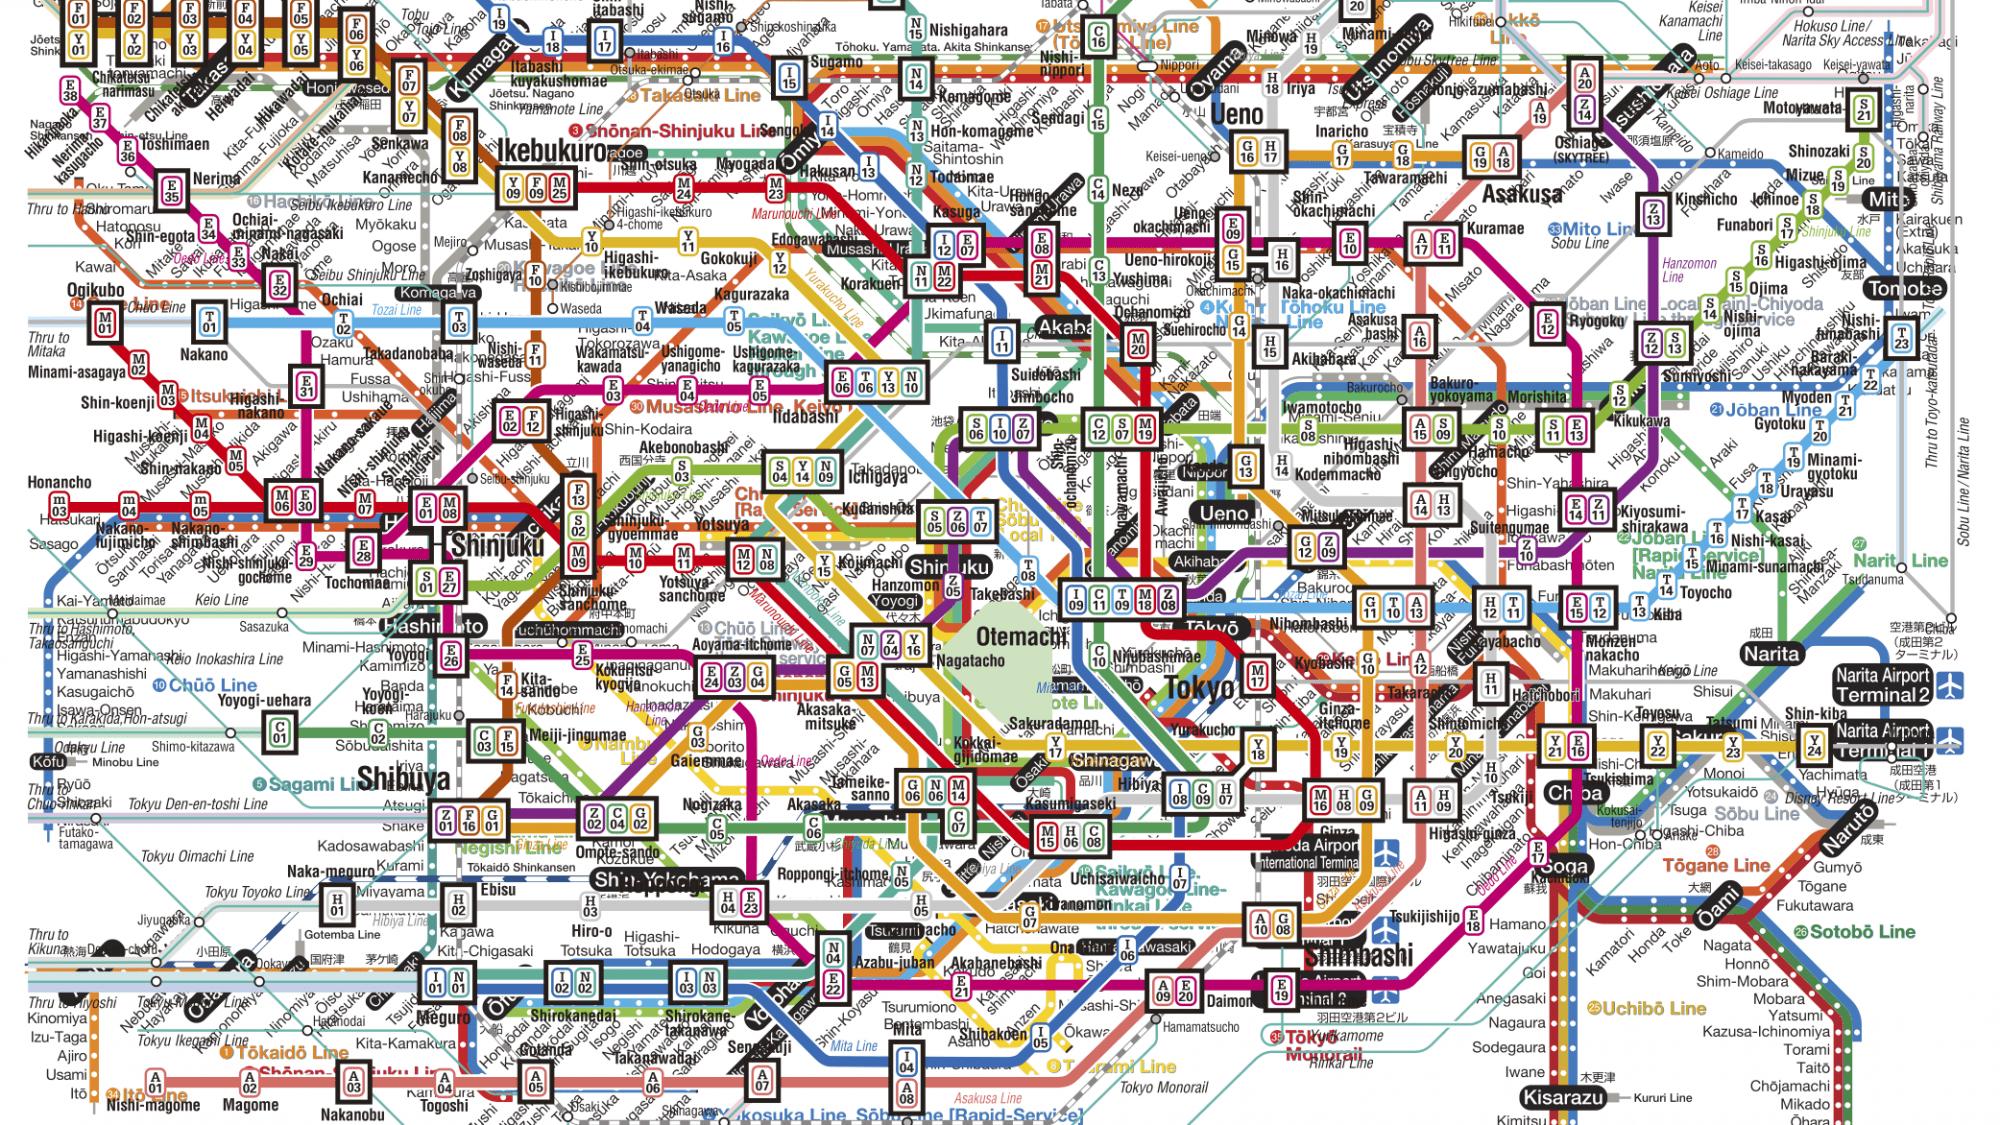 Tokyo Jr Subway Map.Inbetween The Lines Of Tokyo S Jr Metro Maps Randomwire